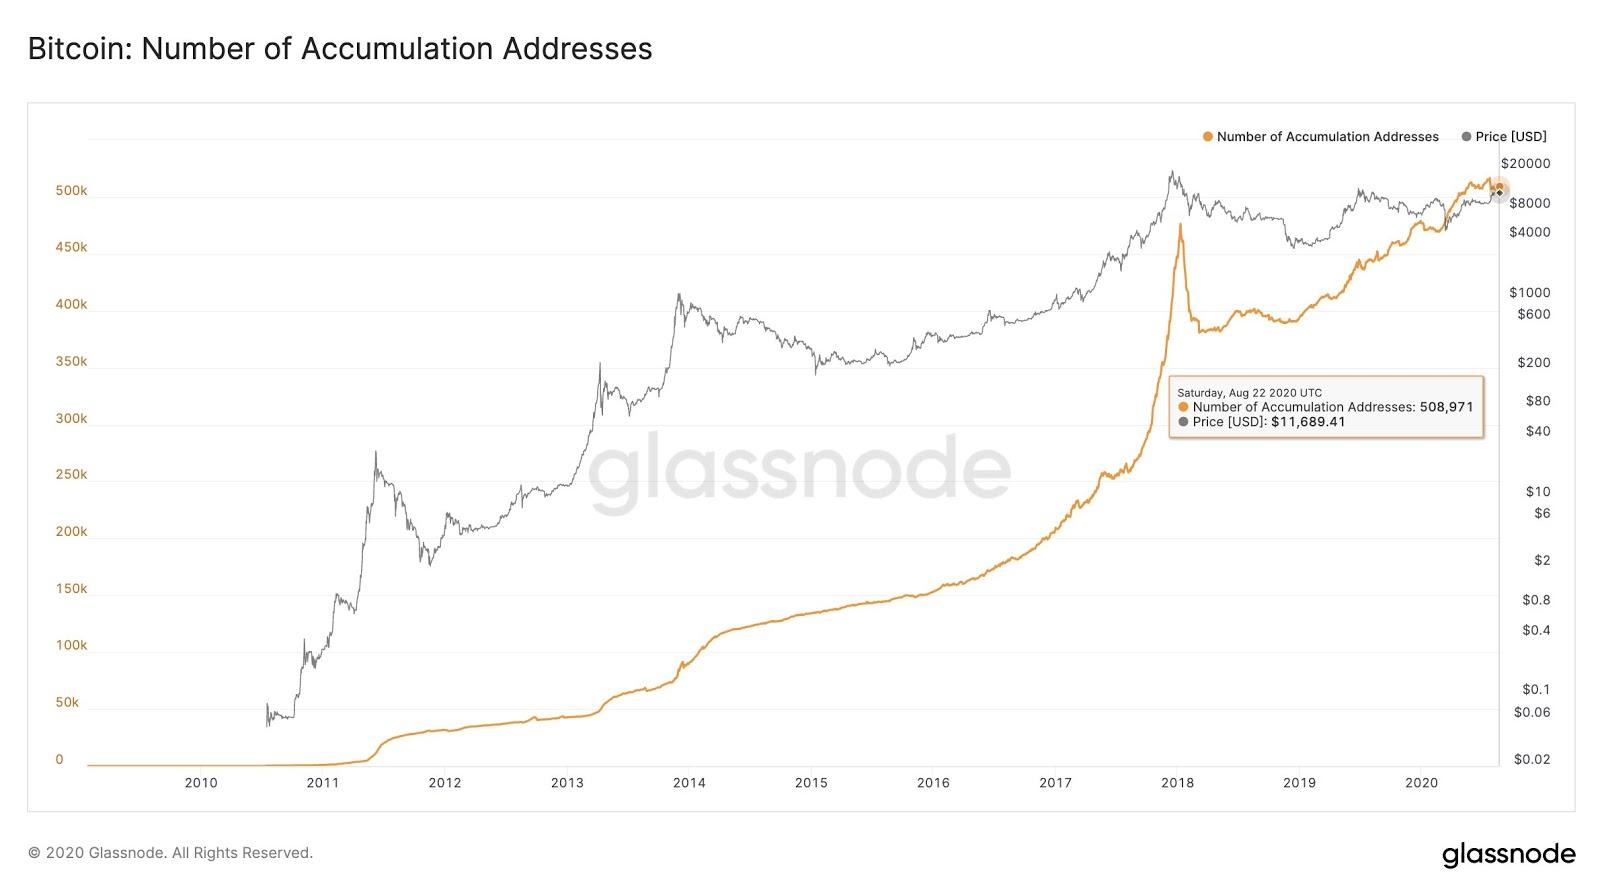 Jumlah alamat akumulasi Bitcoin. Sumber: Glassnode